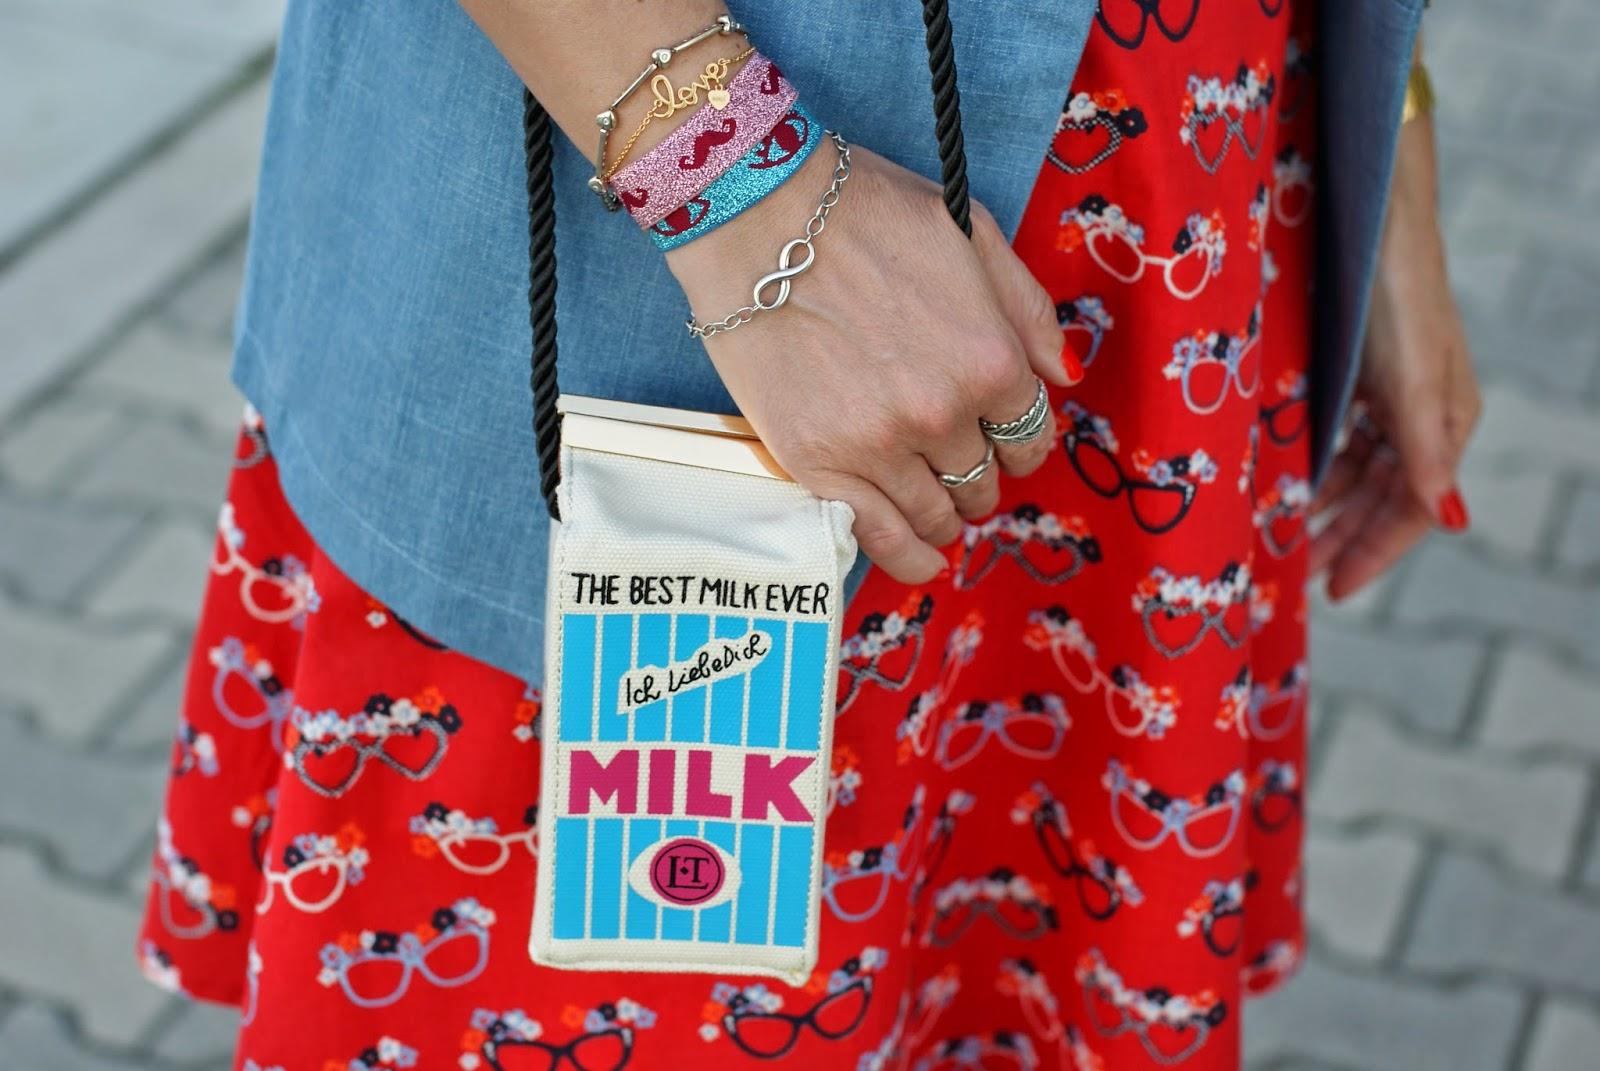 Milk bag Romwe, milk bottle shaped bag, Fashion and Cookies, fashion blogger